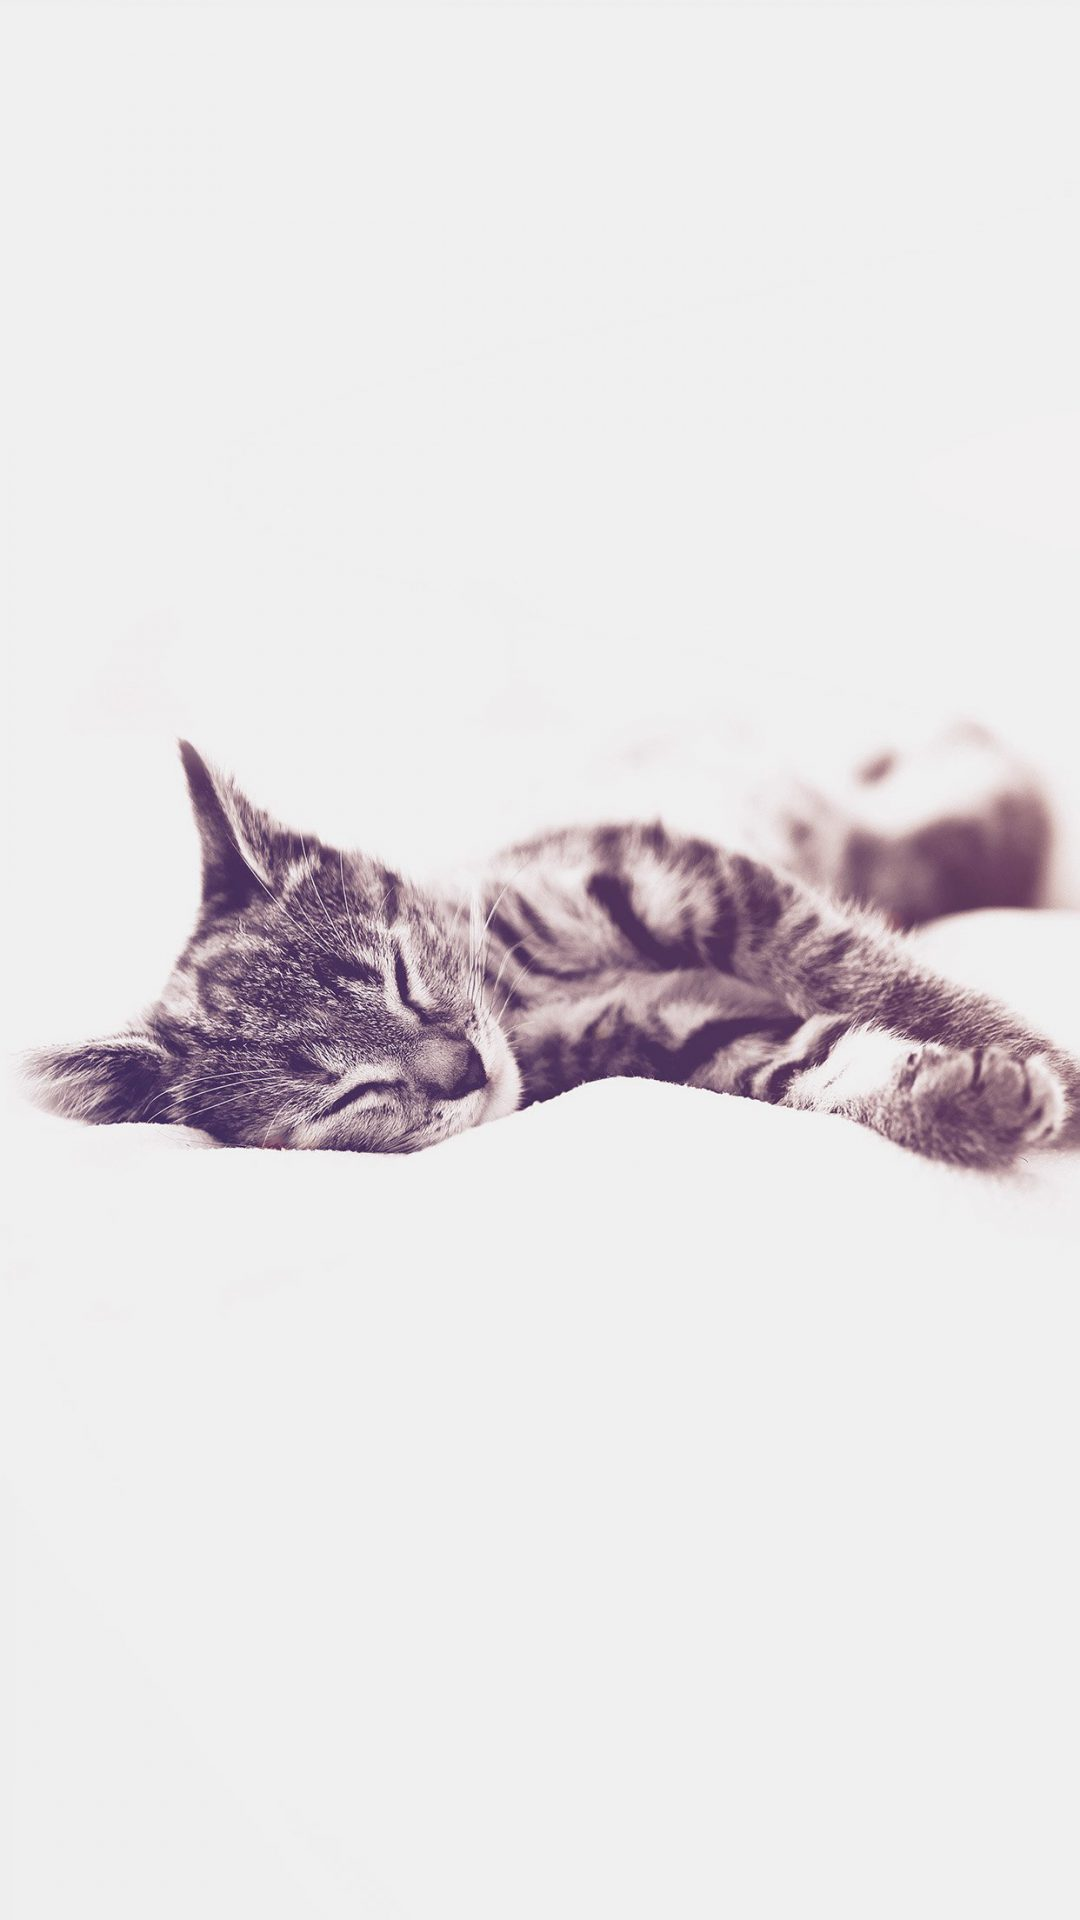 Sleepy Cat Kitten White Animal Blue